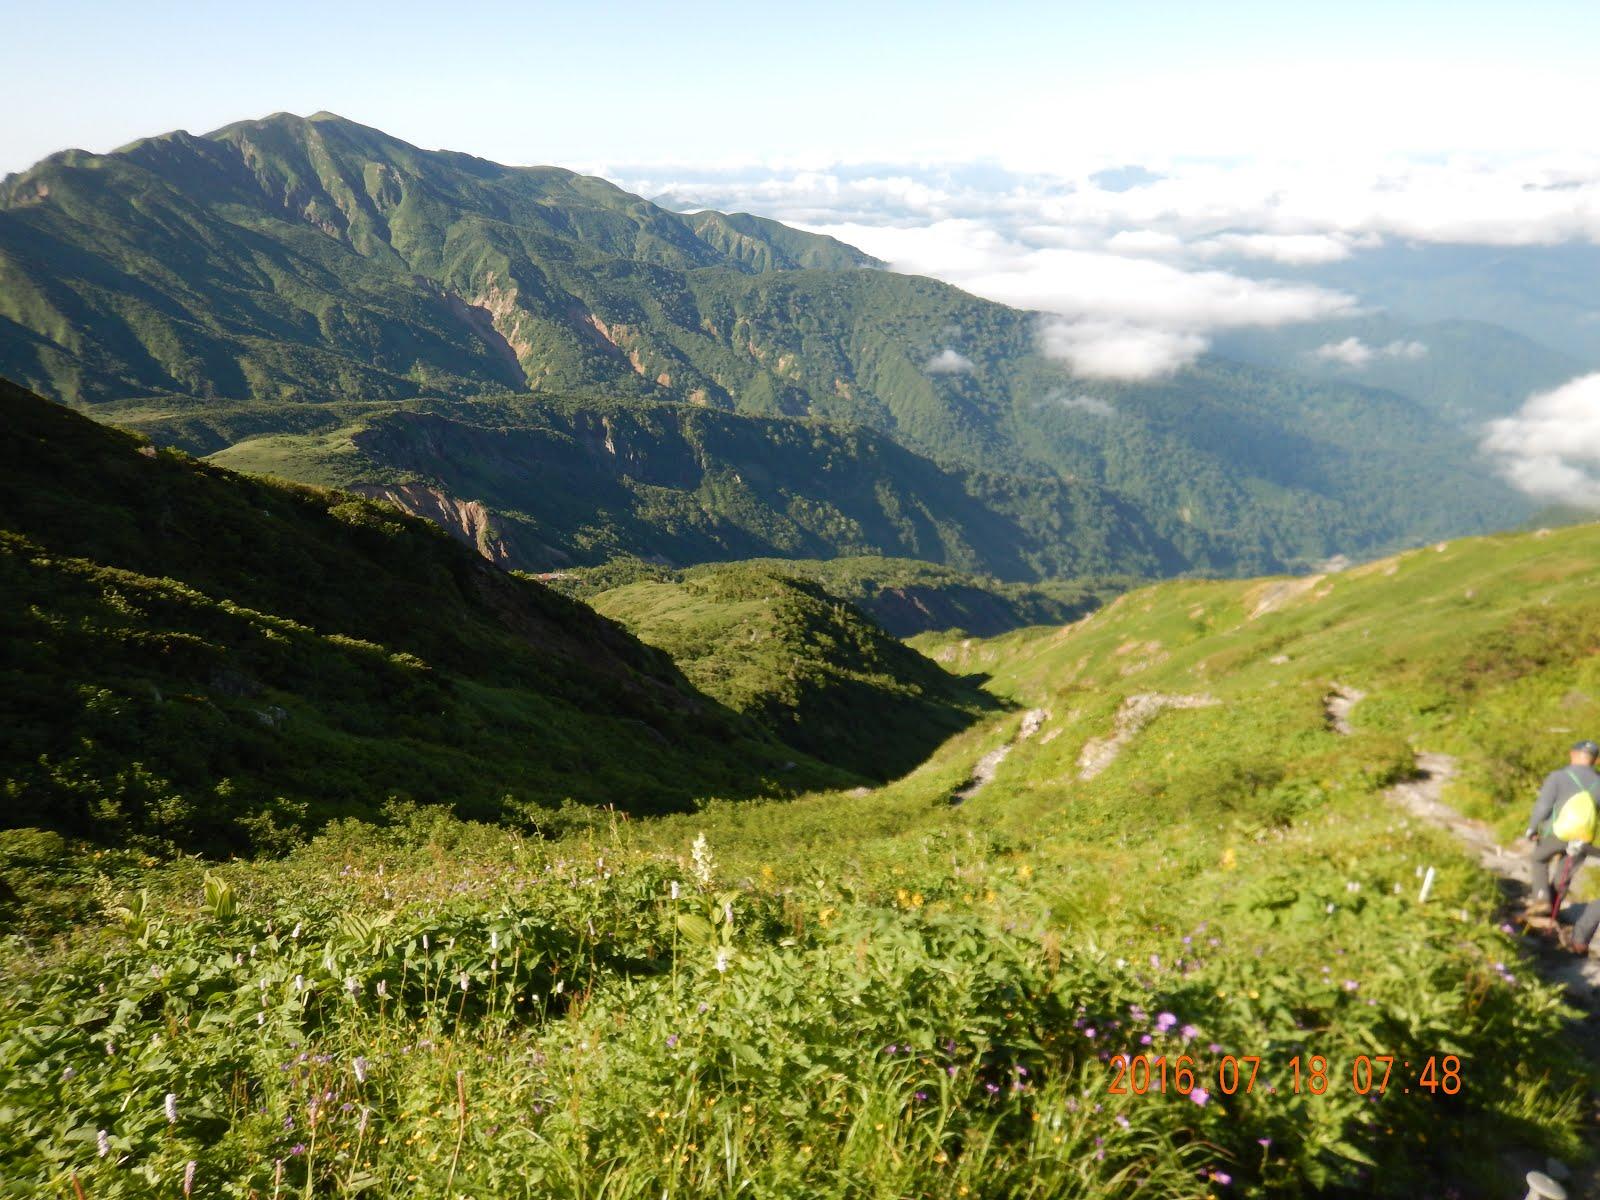 Mt. Haku thumbnails No.7